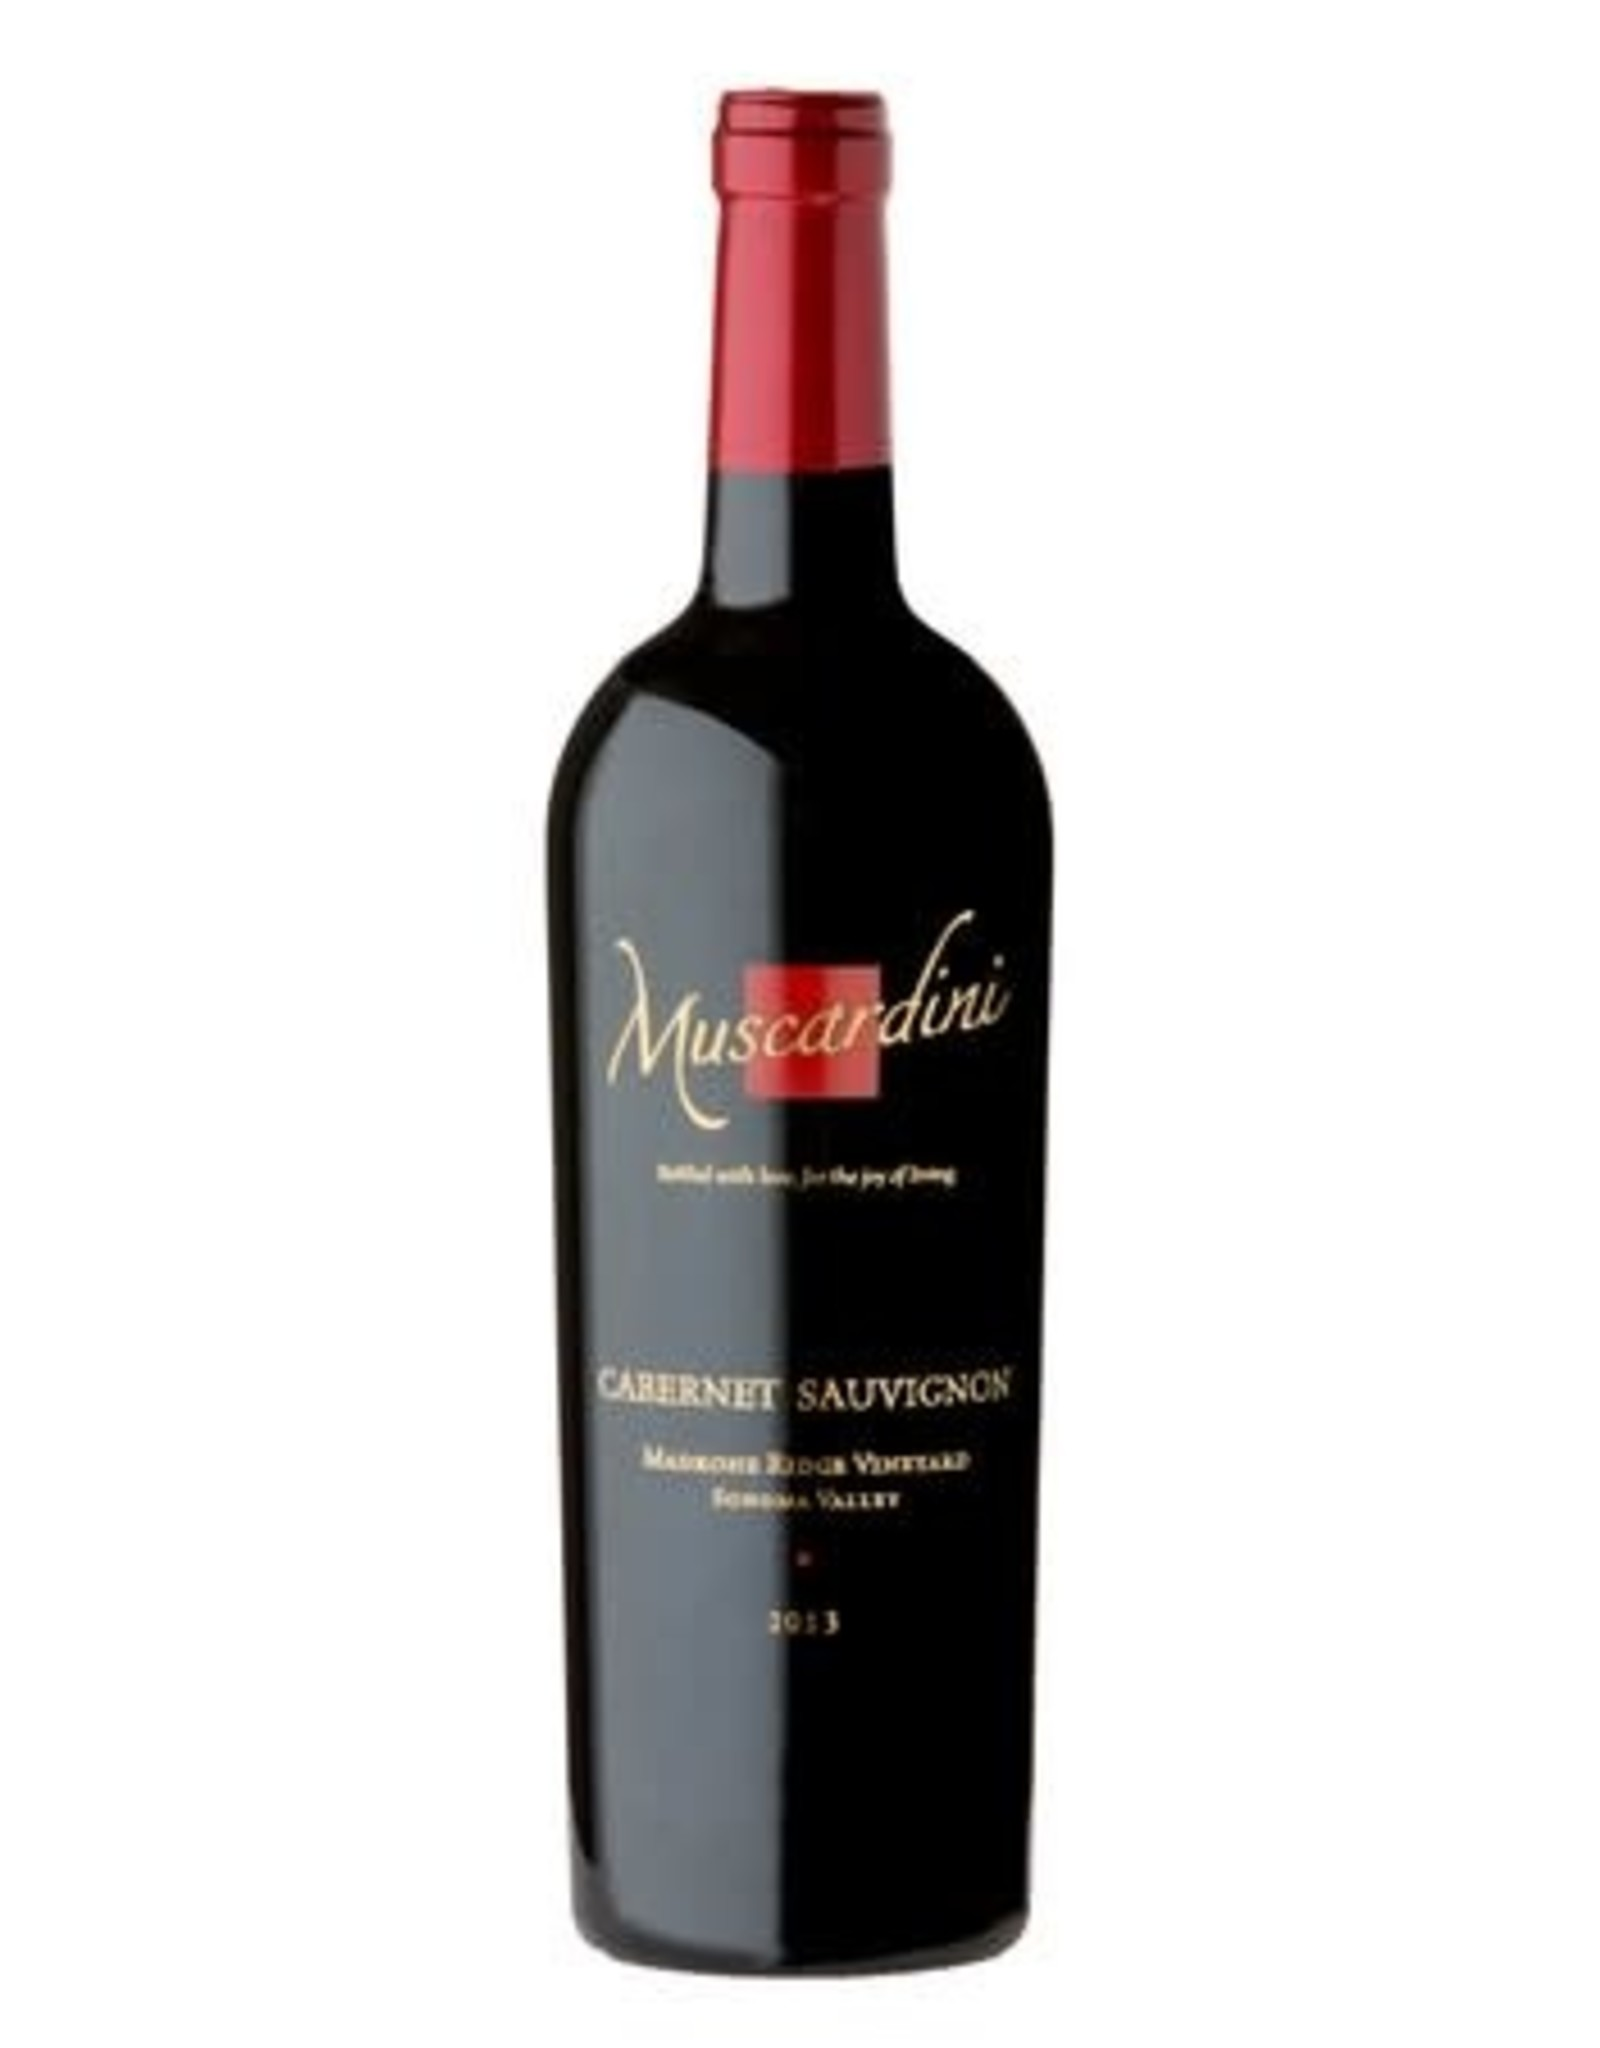 Muscardini Muscardini Madrone Vineyard Cabernet Sauvignon, Sonoma County 2015